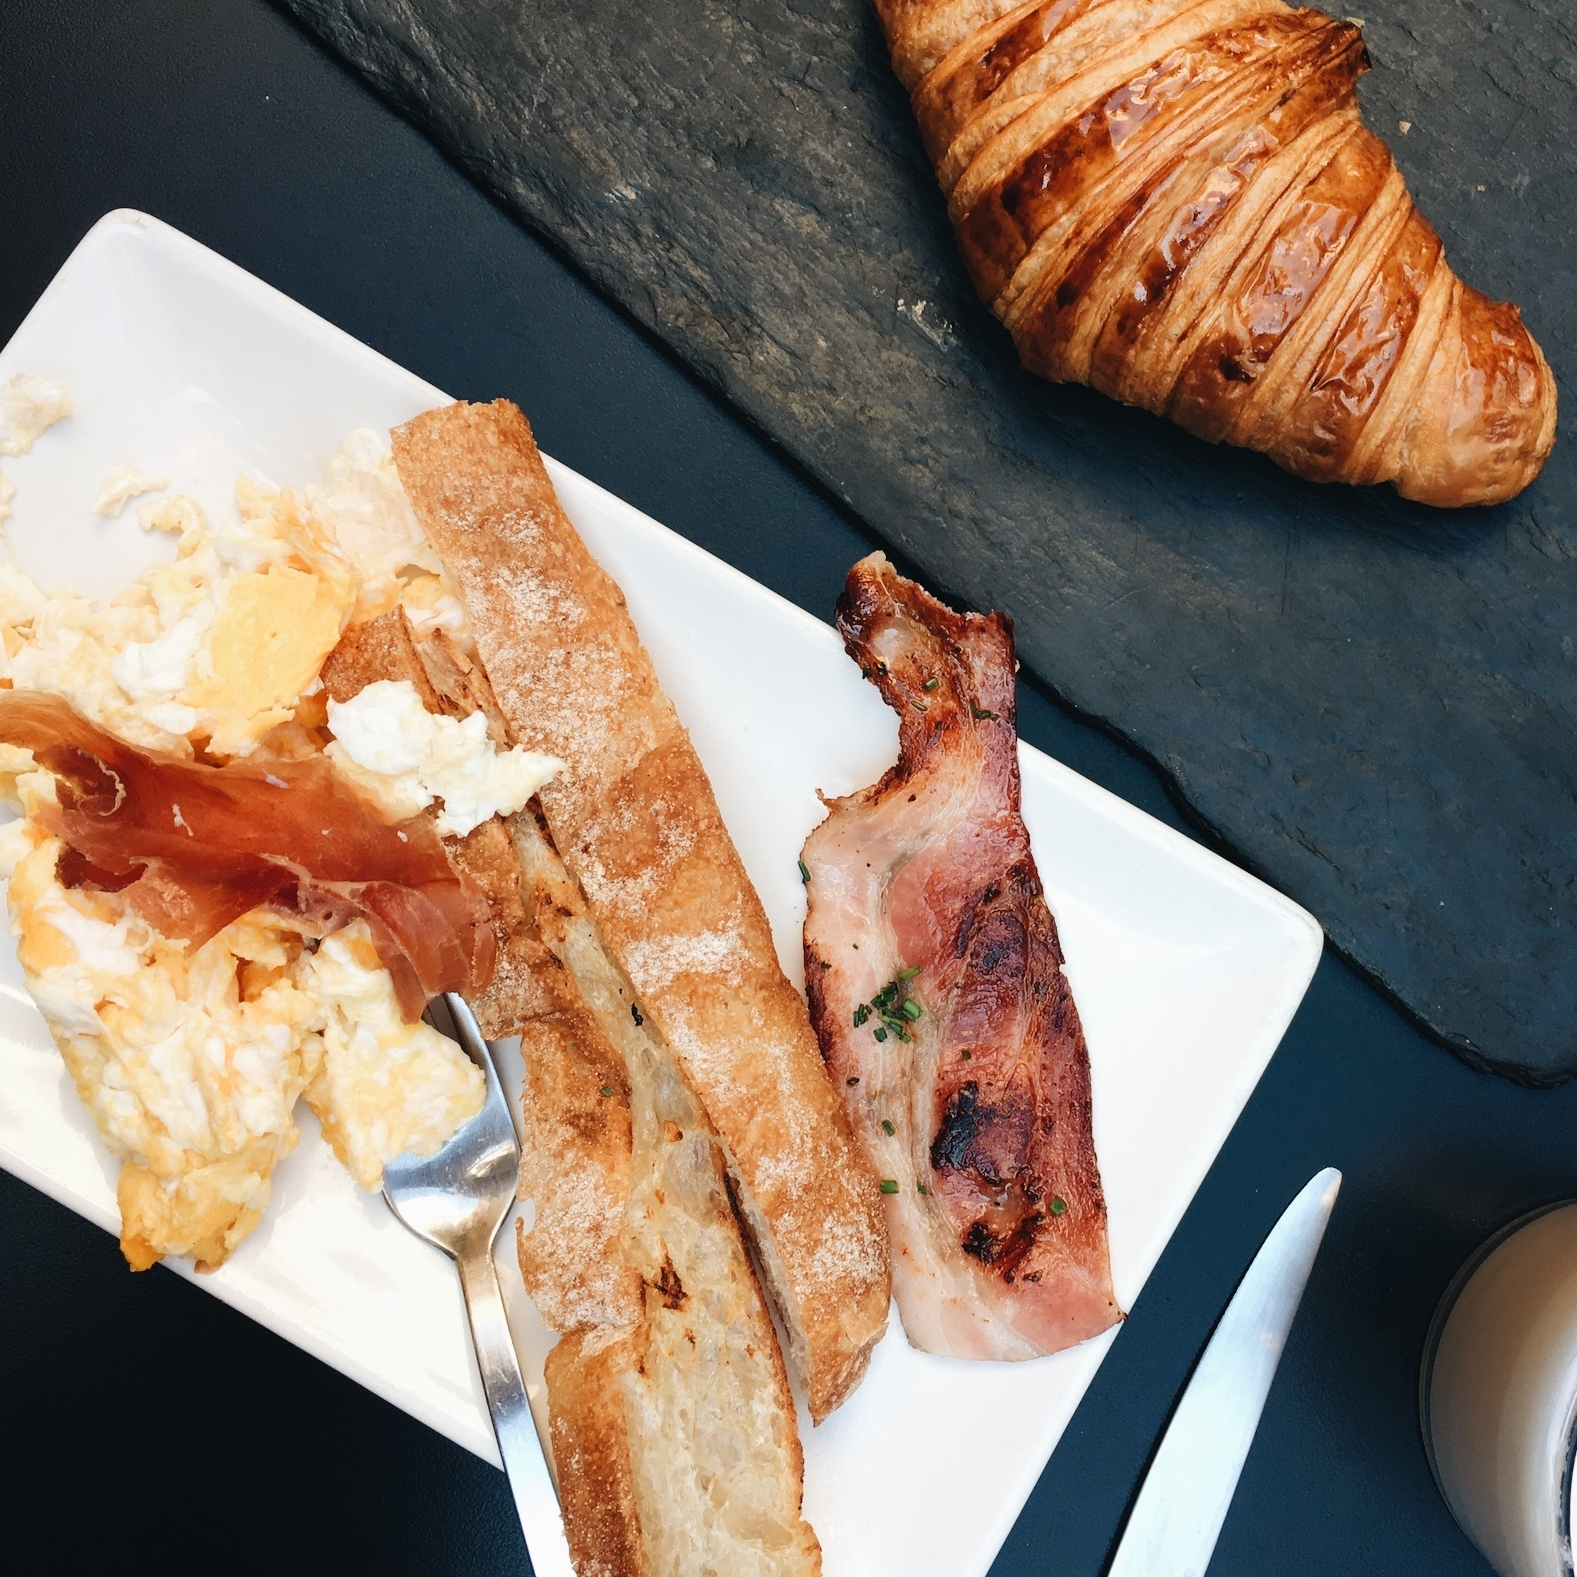 2e8d6-seesoomuch_barcelona_breakfastseesoomuch_barcelona_breakfast.jpg